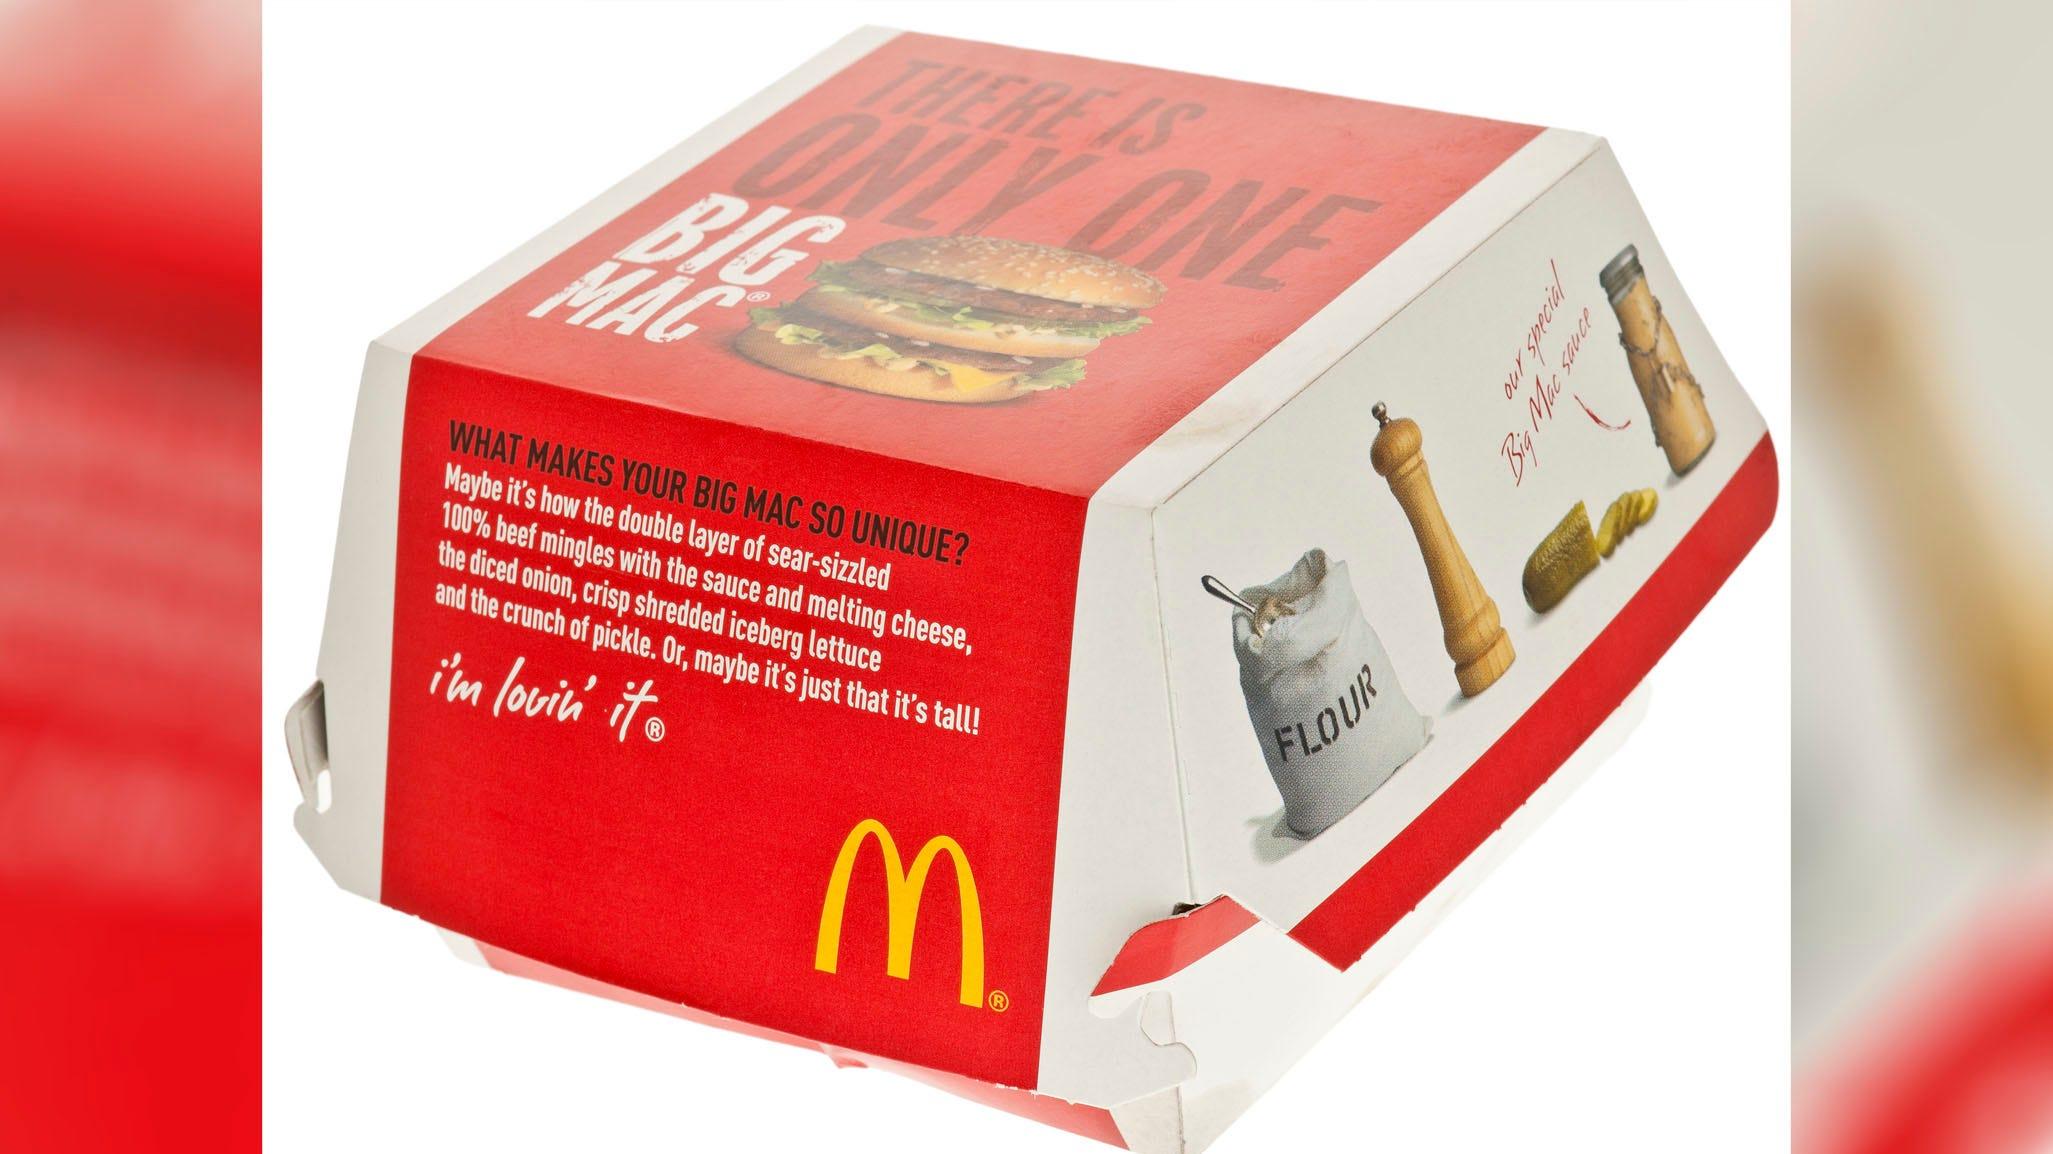 Westlake Legal Group McDonalds-burger-box 20-year-old McDonald's burger still looks brand new, smells like cardboard Michael Hollan fox-news/food-drink/food/restaurants fox-news/food-drink/food/fast-food fox news fnc/food-drink fnc article 031375bb-0f1f-5b28-9be0-d27672fbc6bf